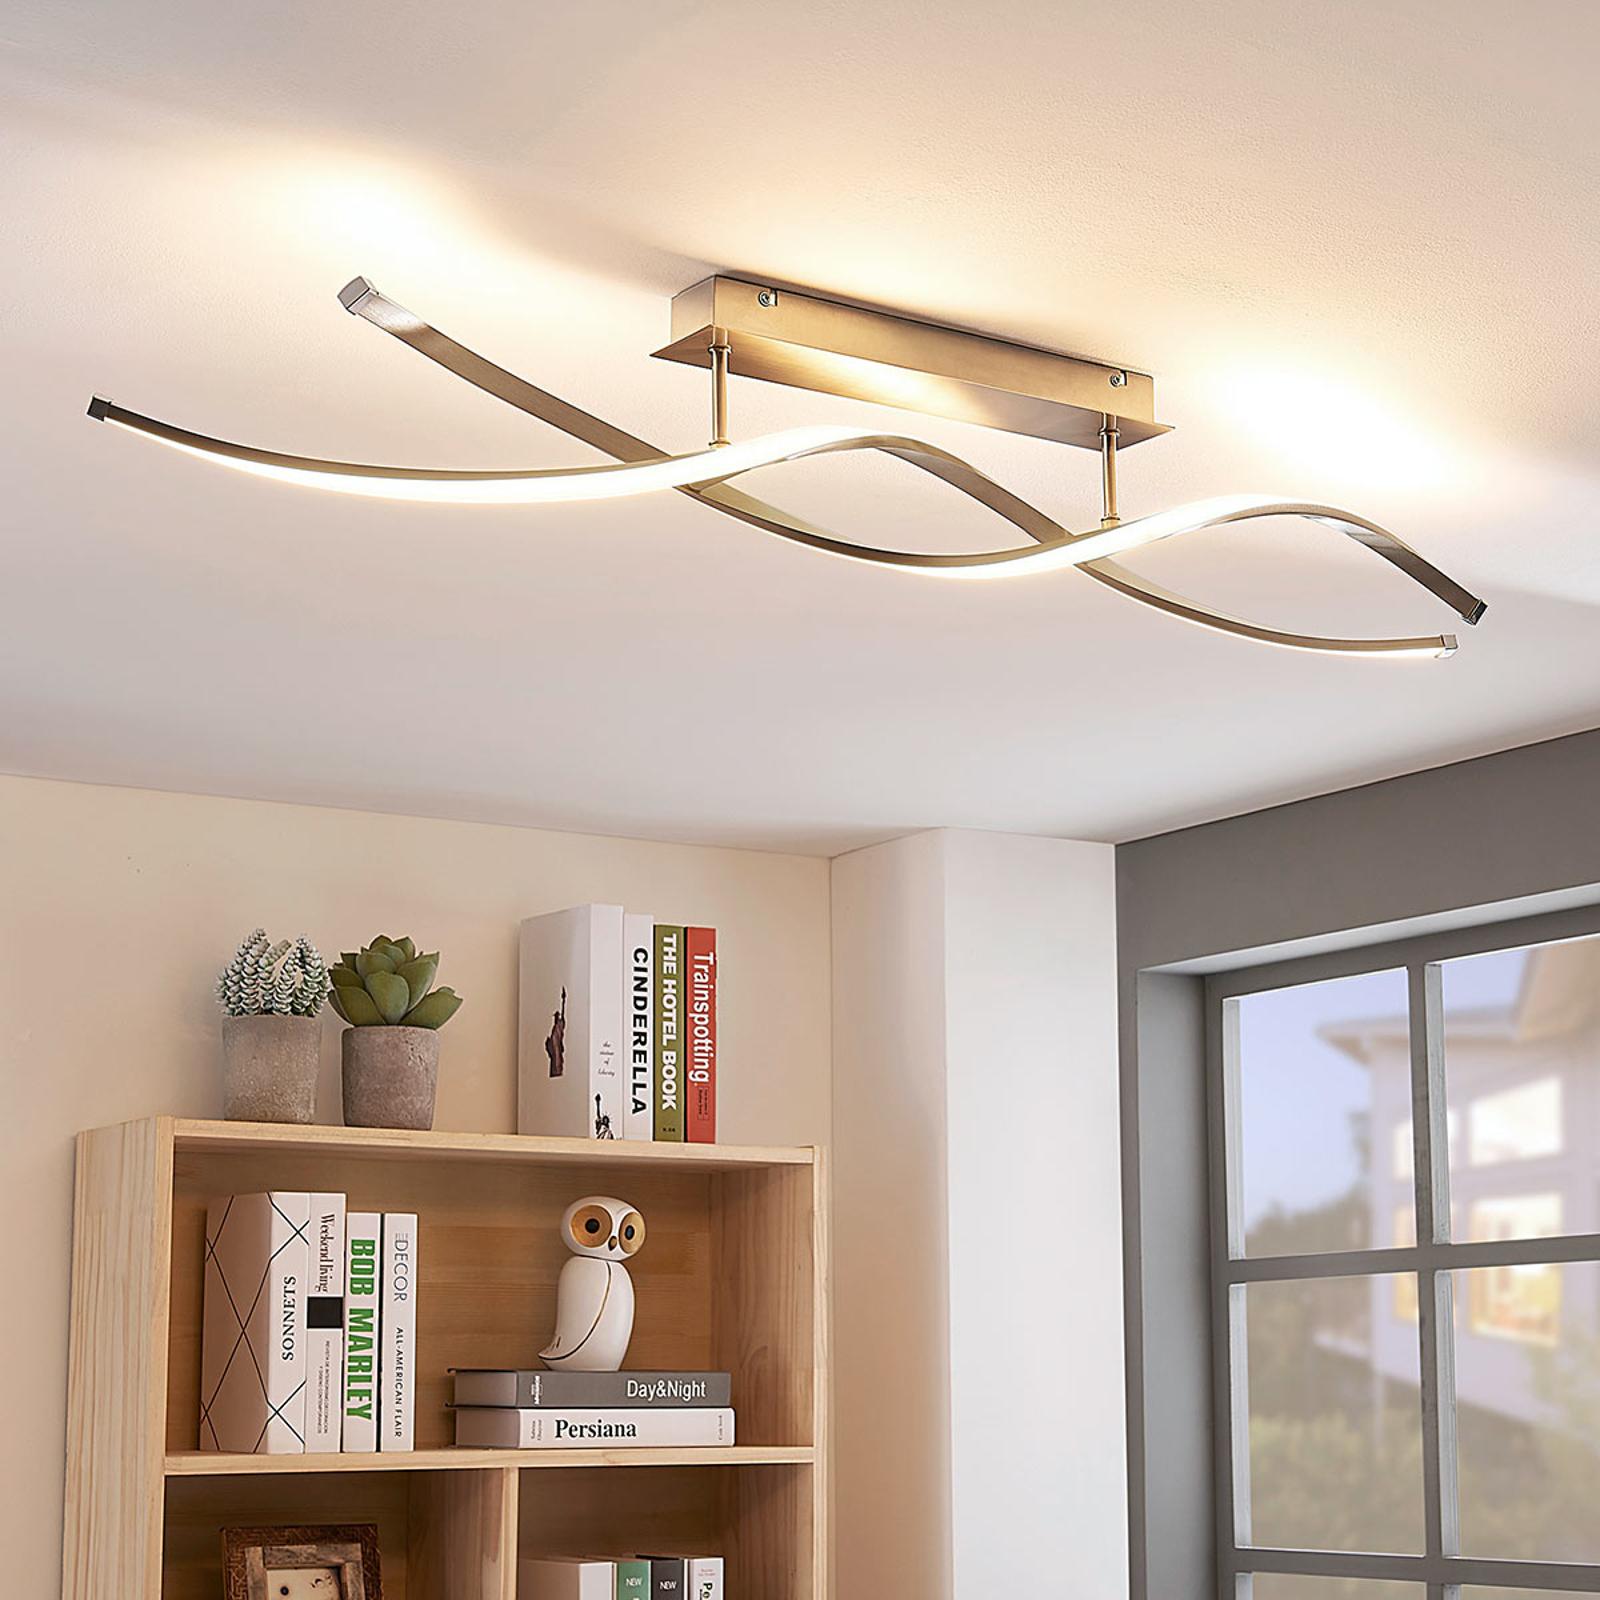 Spiralförmige LED-Deckenlampe Kati, dimmbar